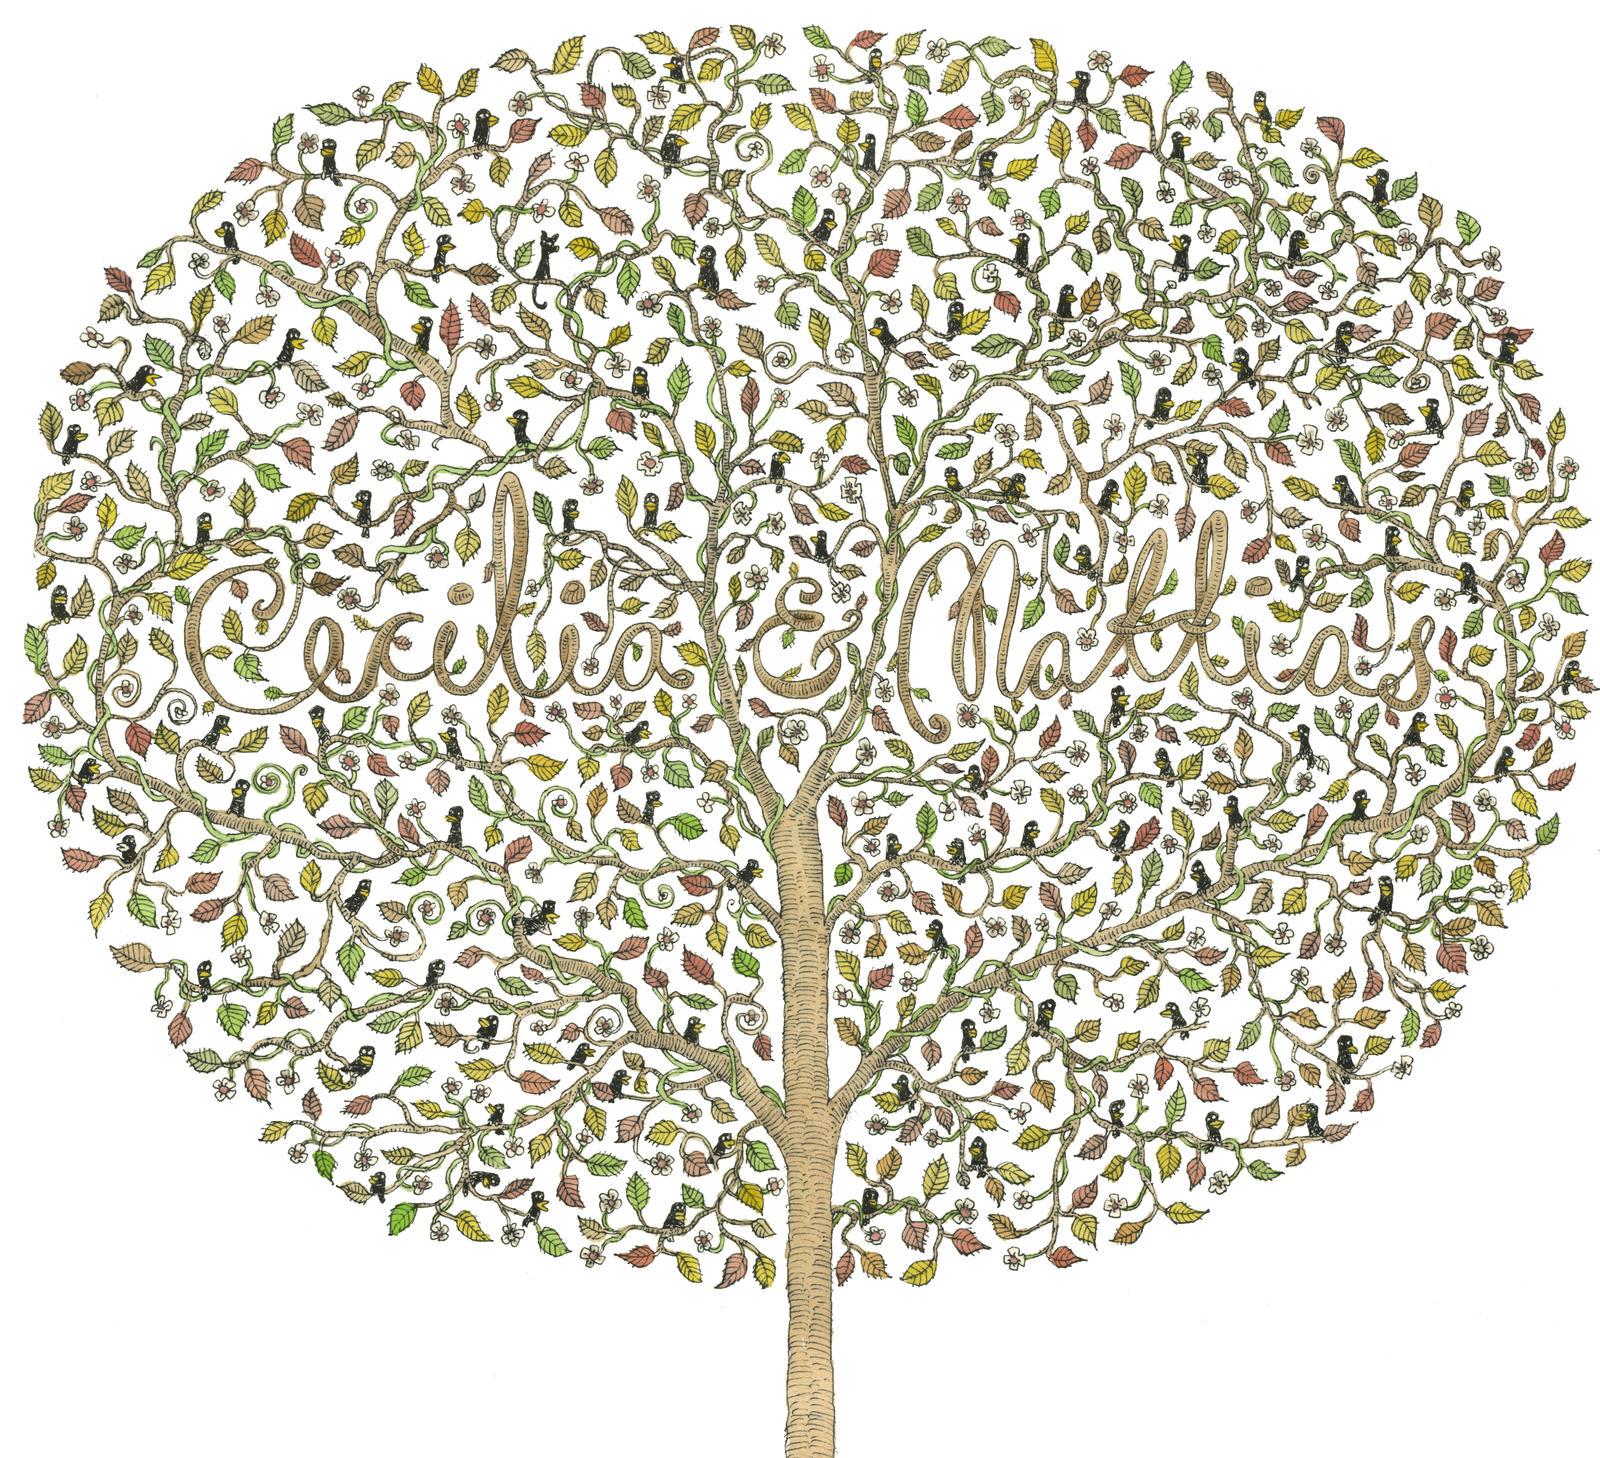 Poster tree by MattiasA